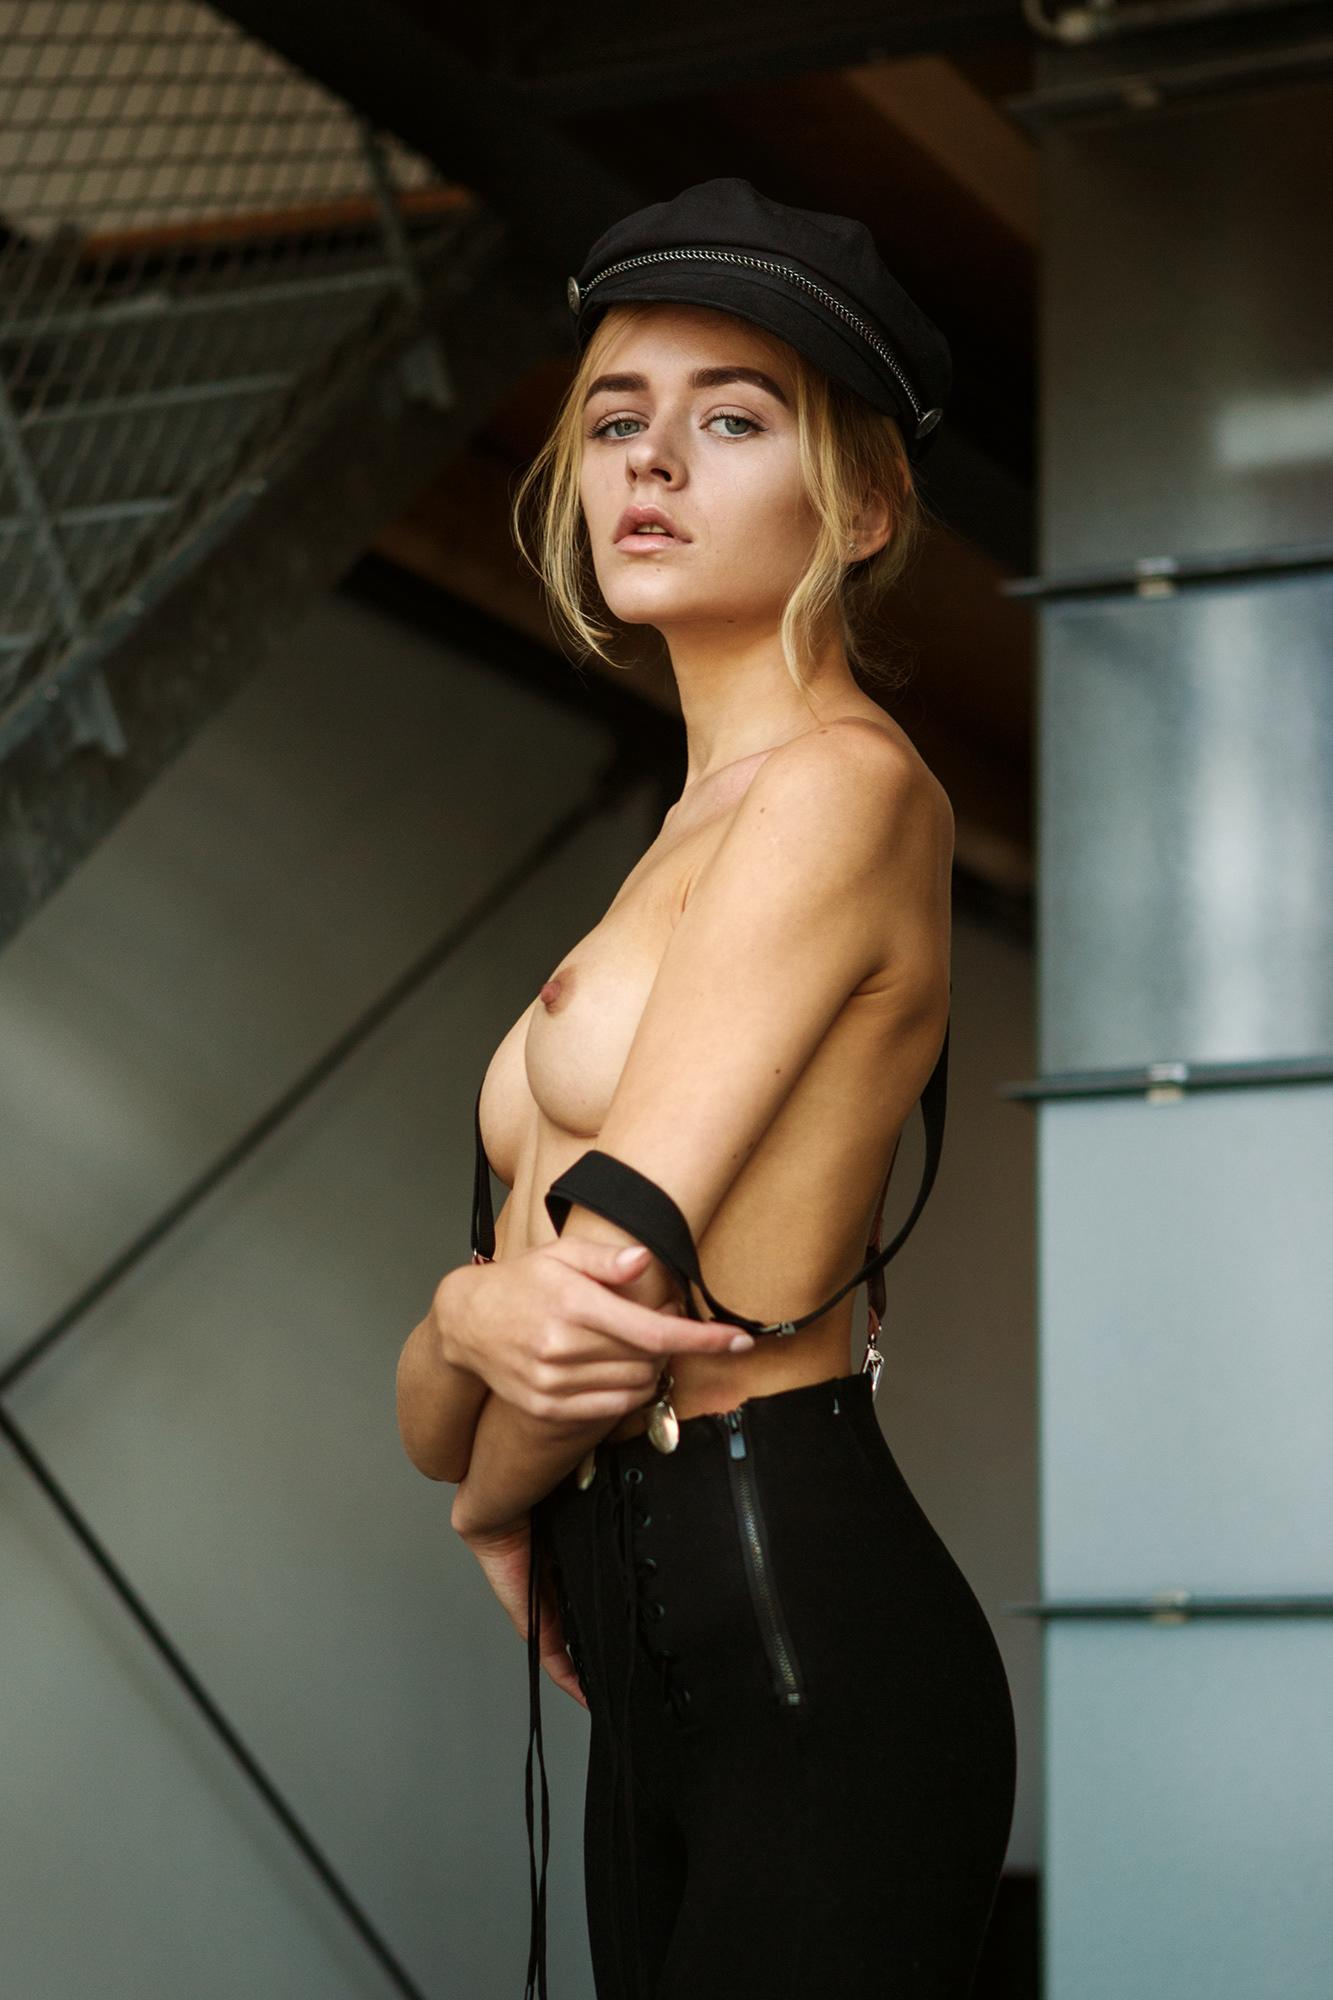 Lana / фотограф Hannes Walendy